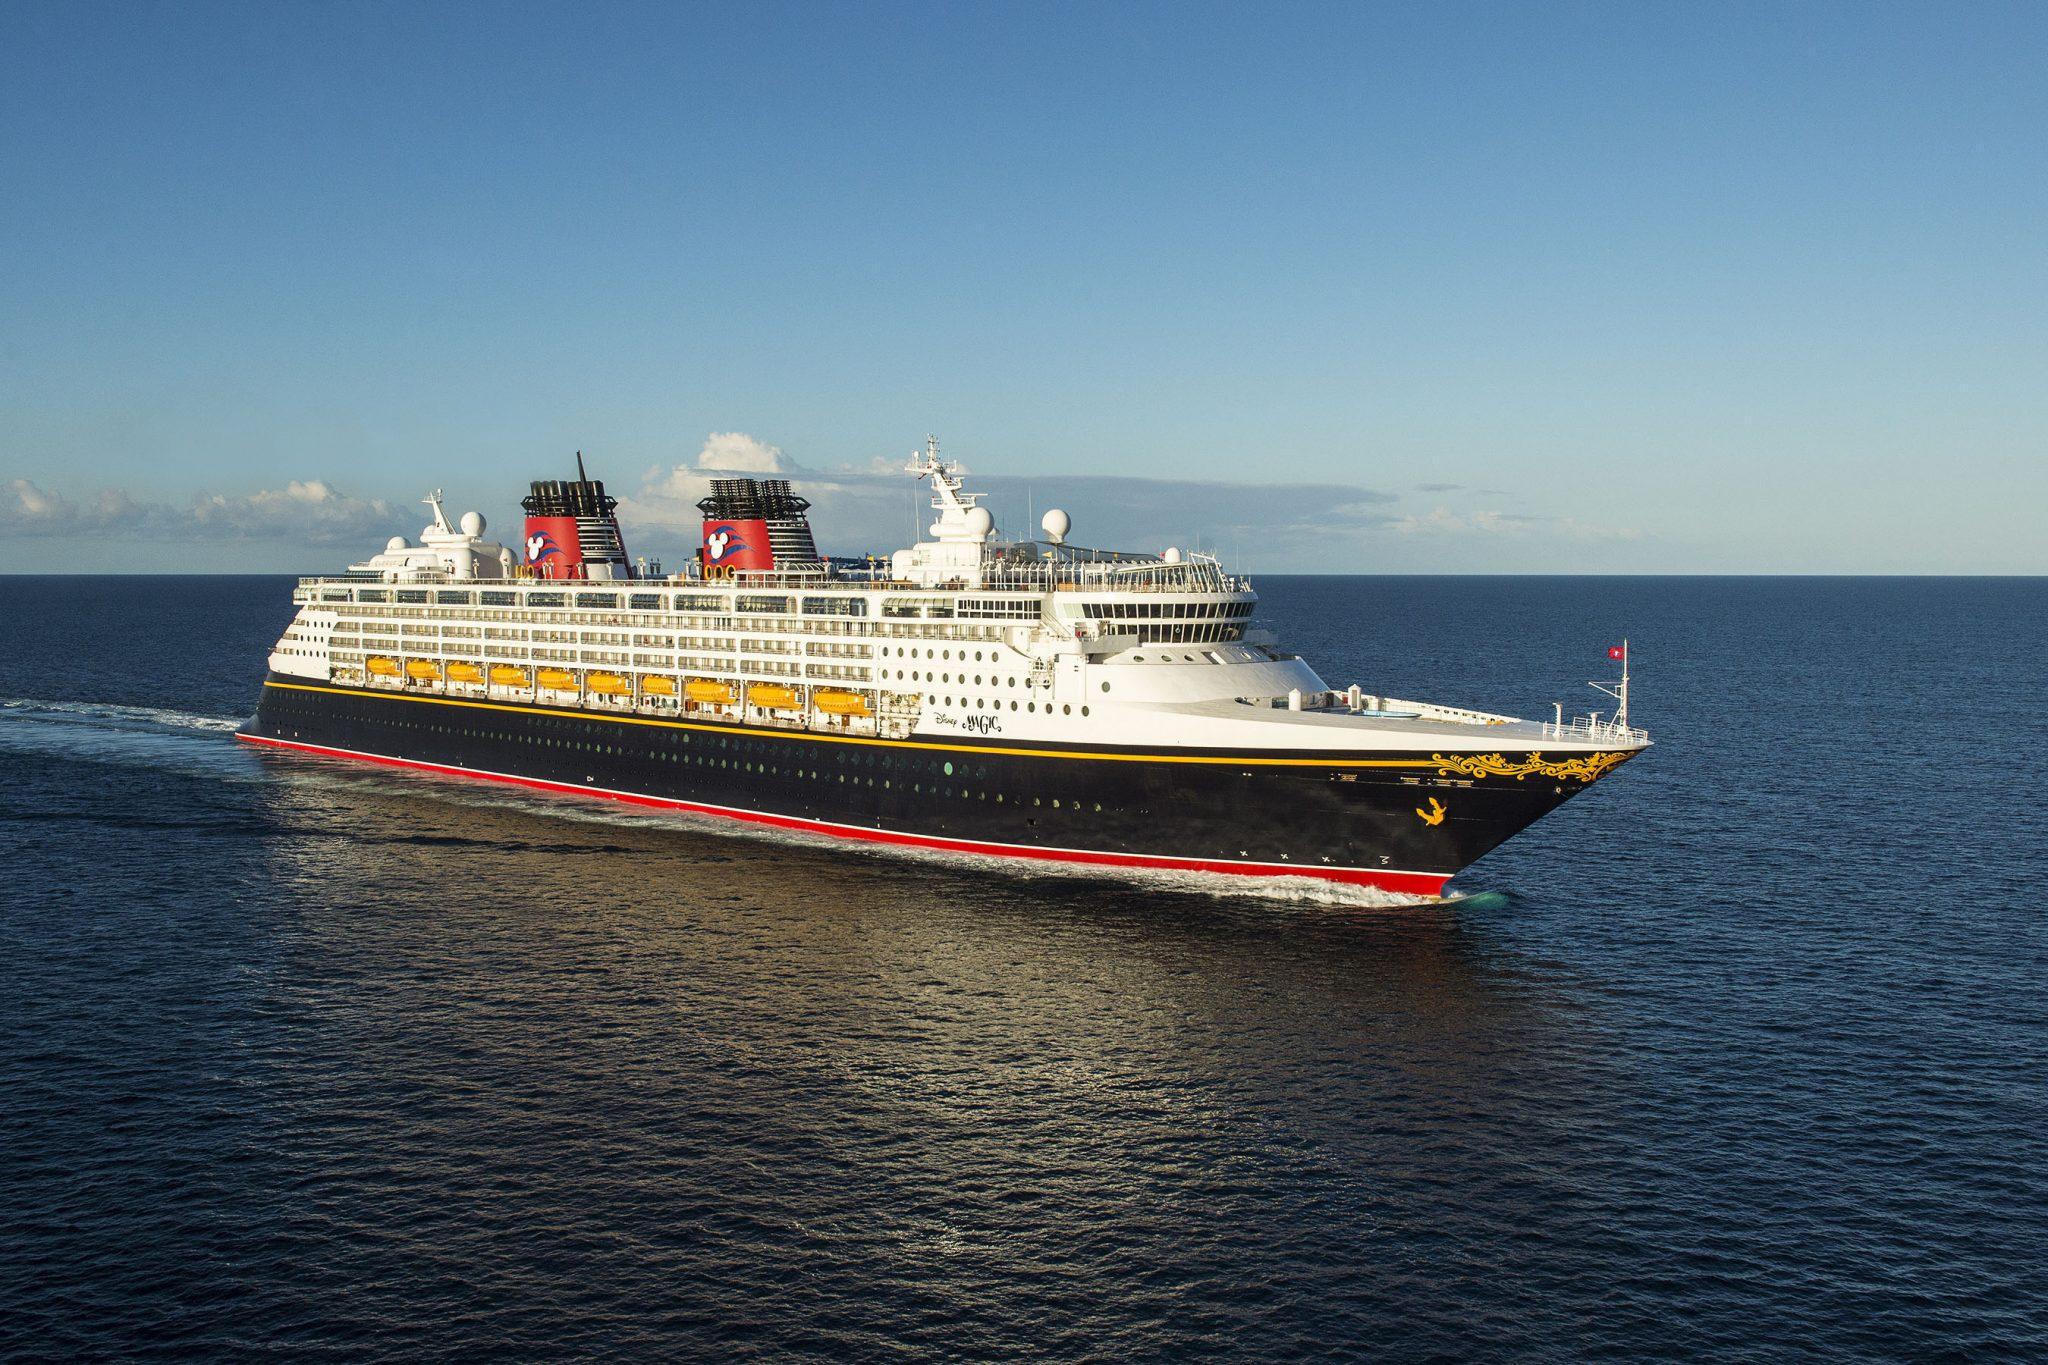 ResortLoop.com Episode 143 – Bob's Trip On The Disney Dream